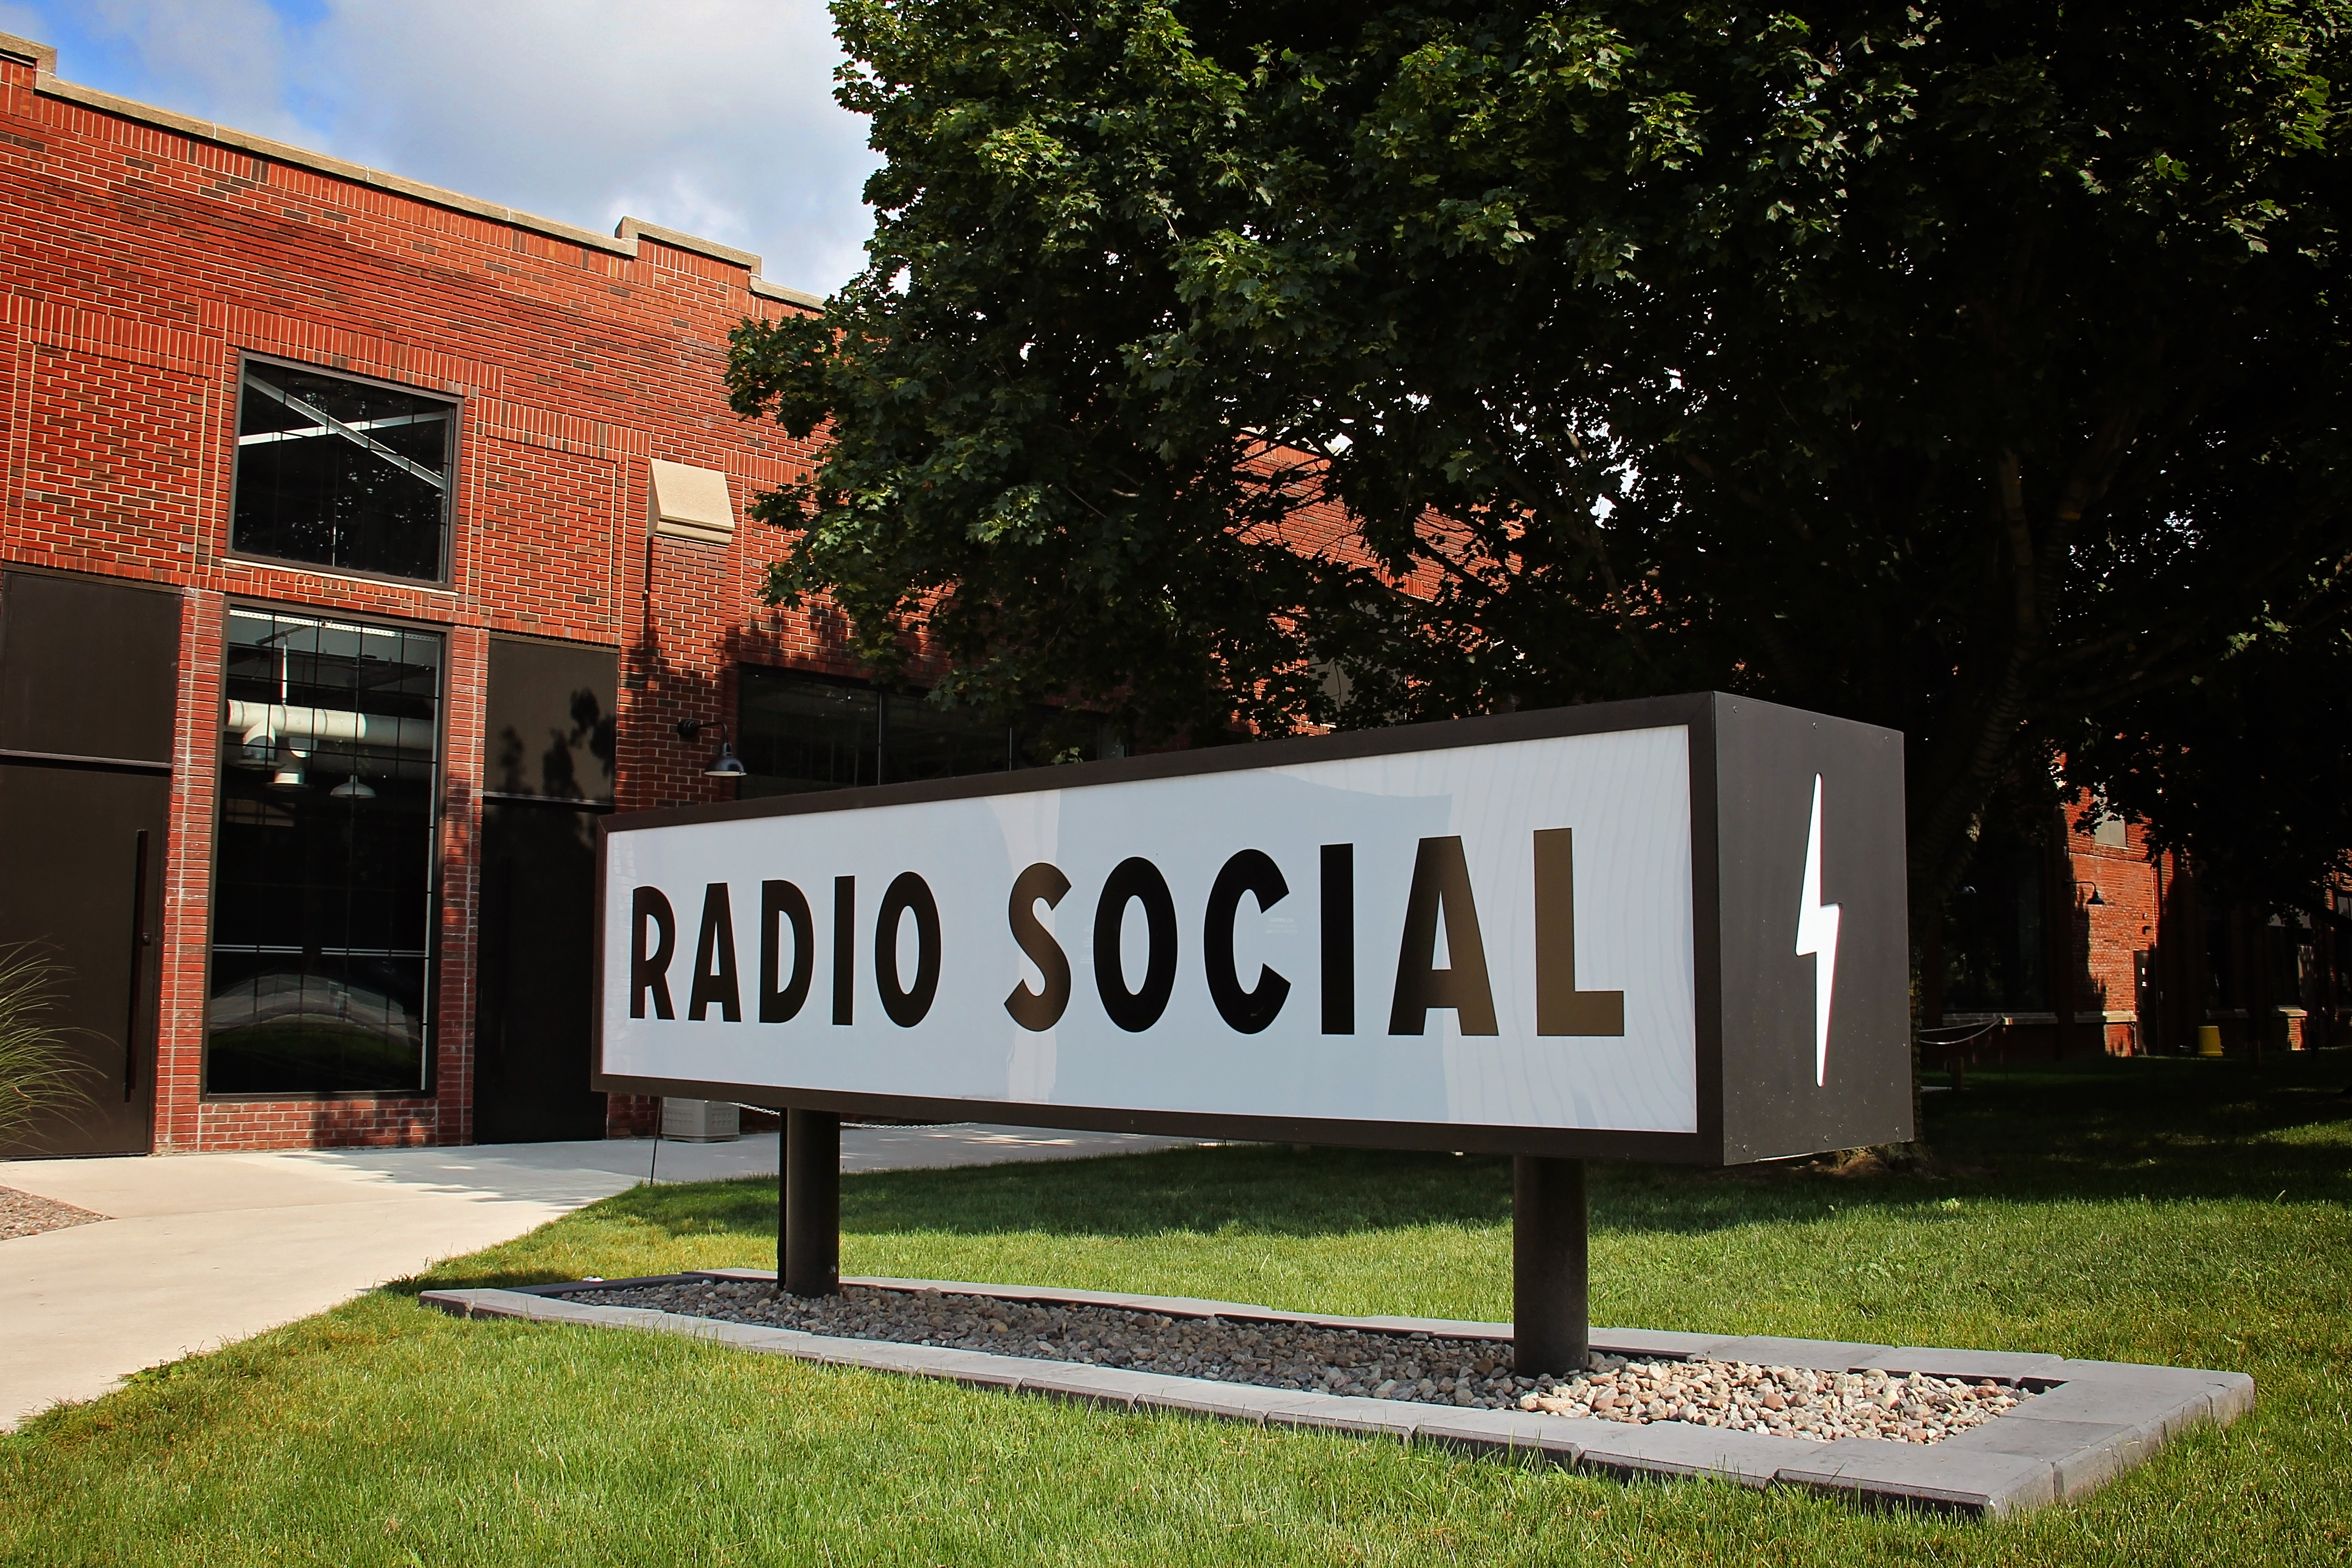 Radio Social Signage